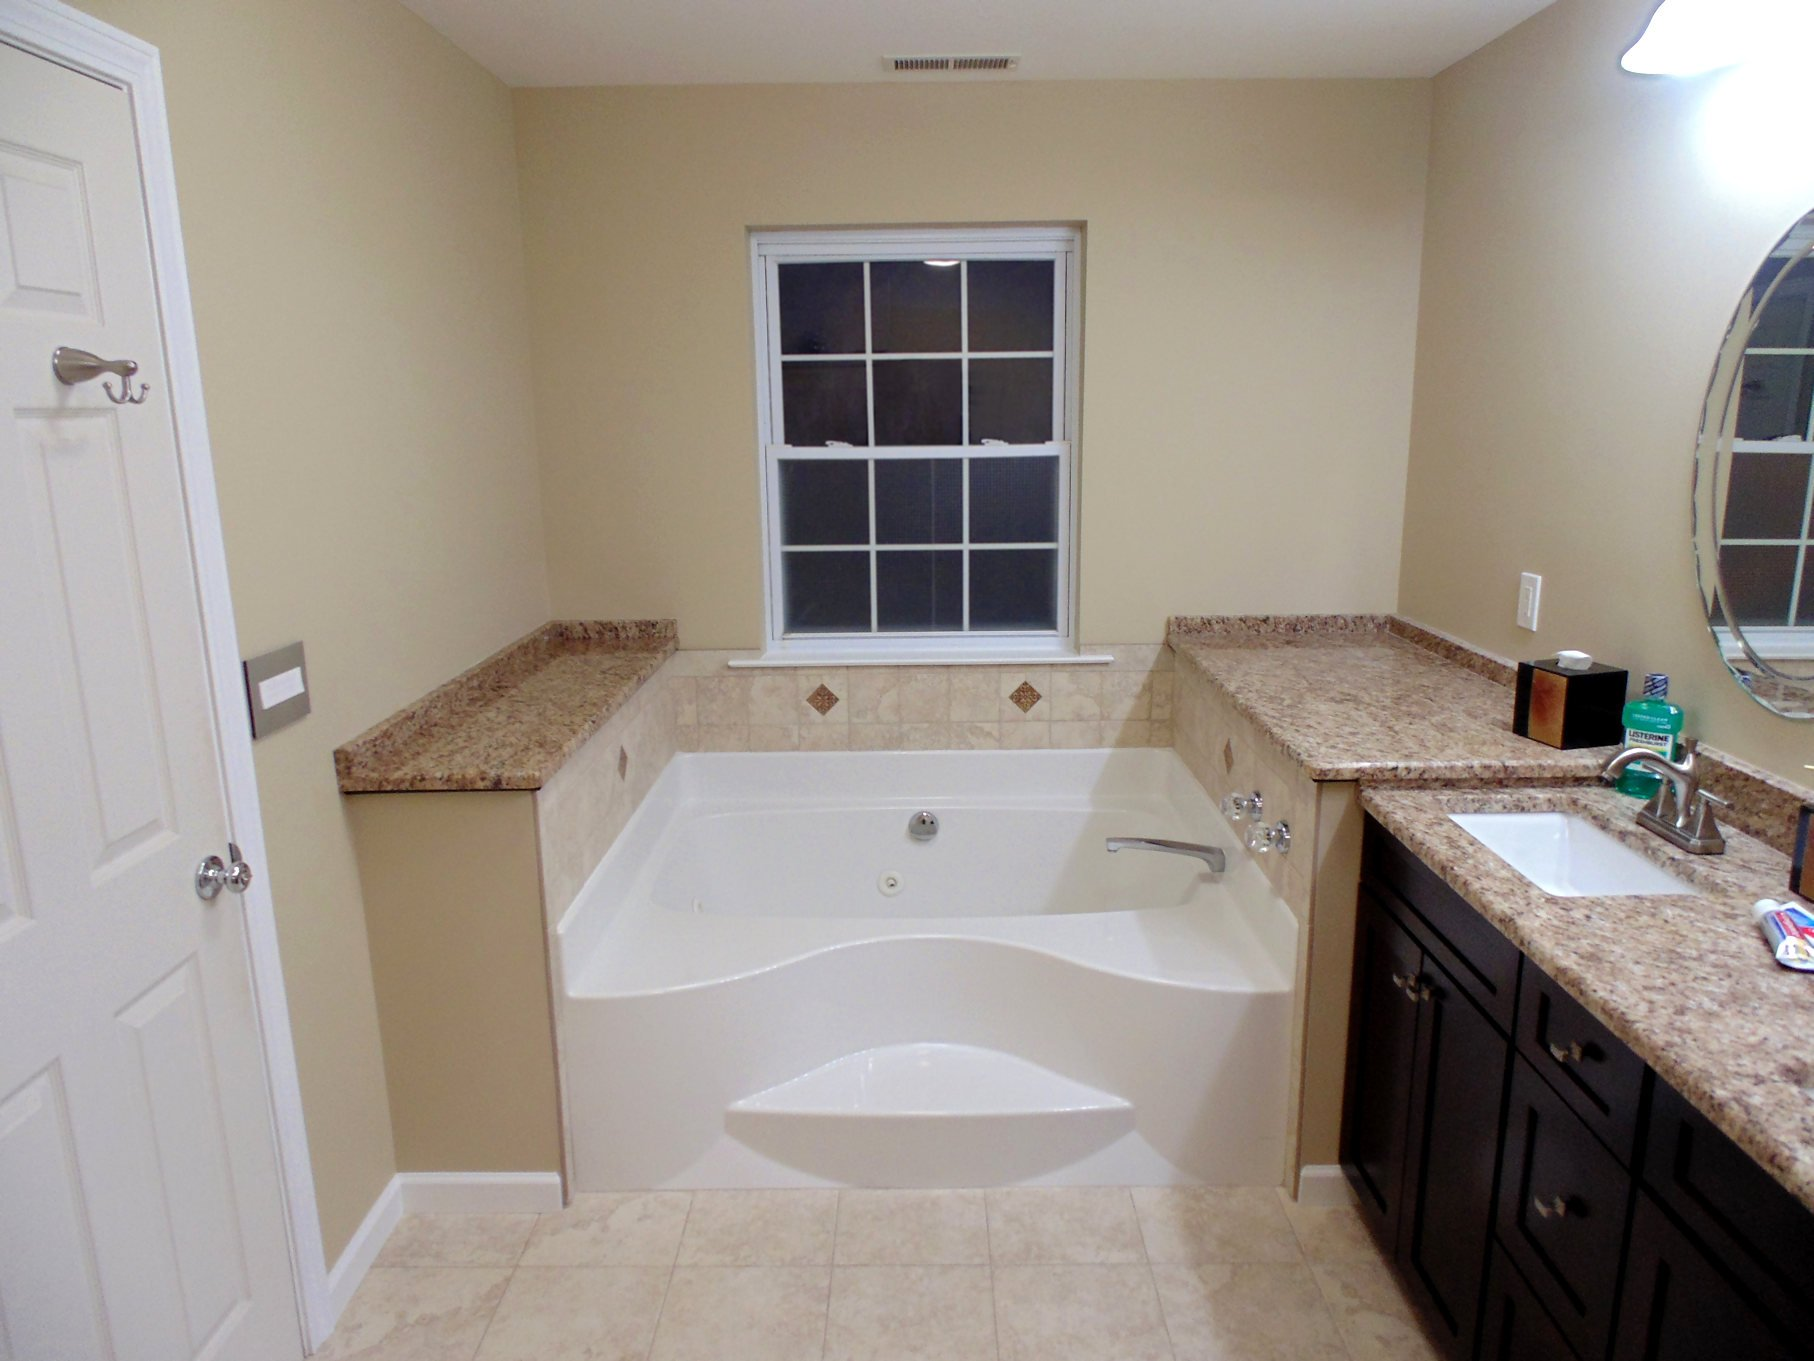 Farmington Connecticut — Bathroom Renovation